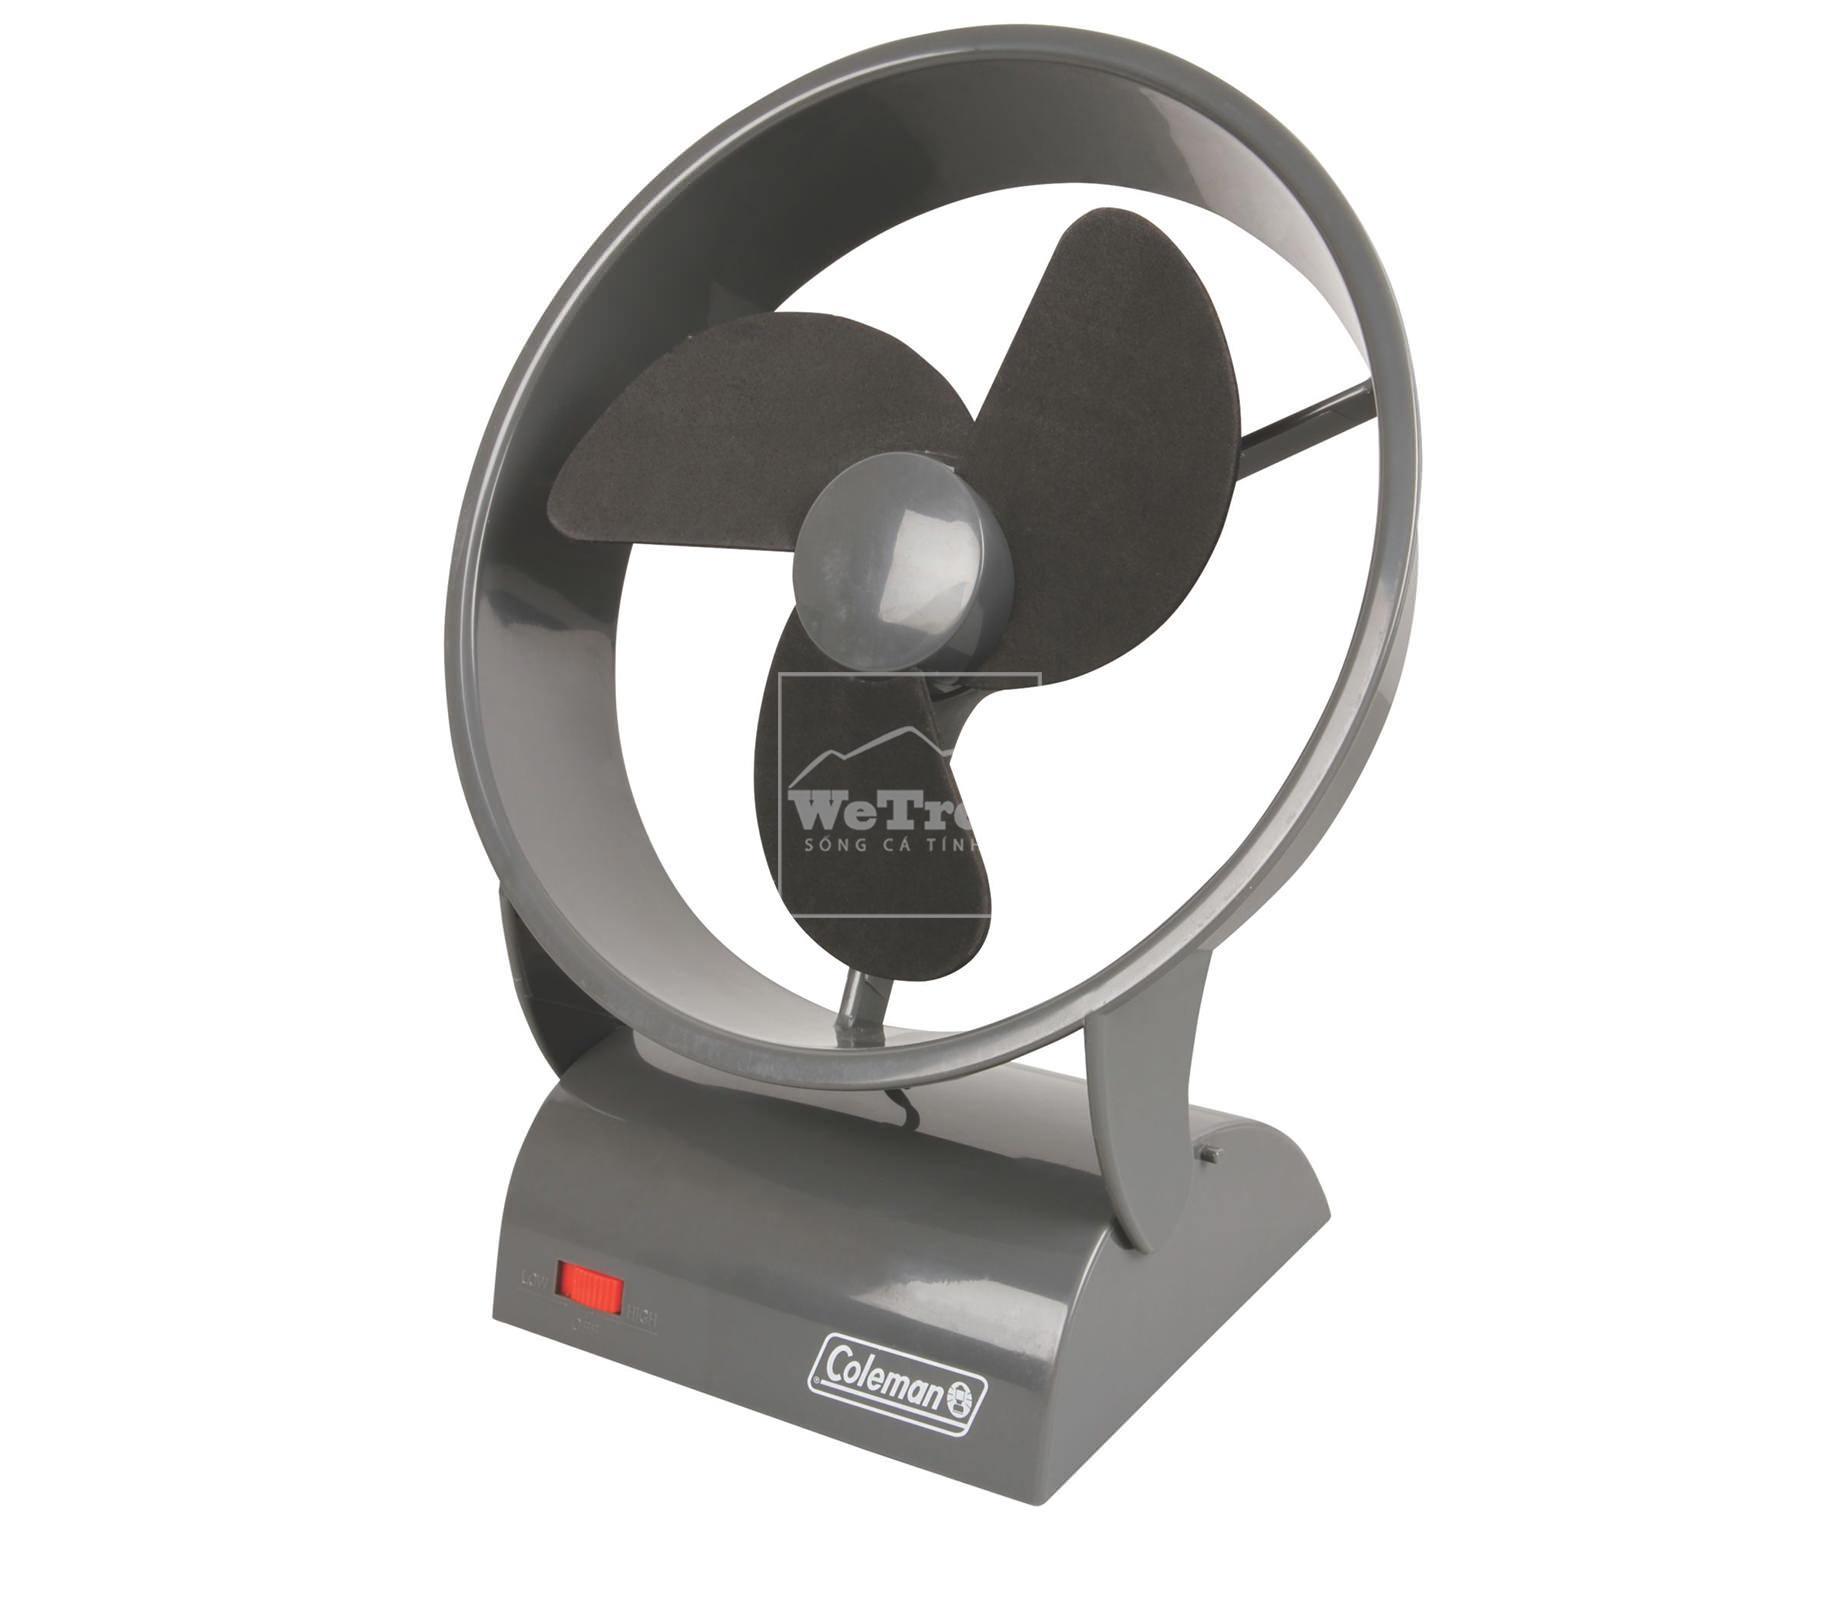 Quạt Coleman Free Standing Tent Fan 2000016492